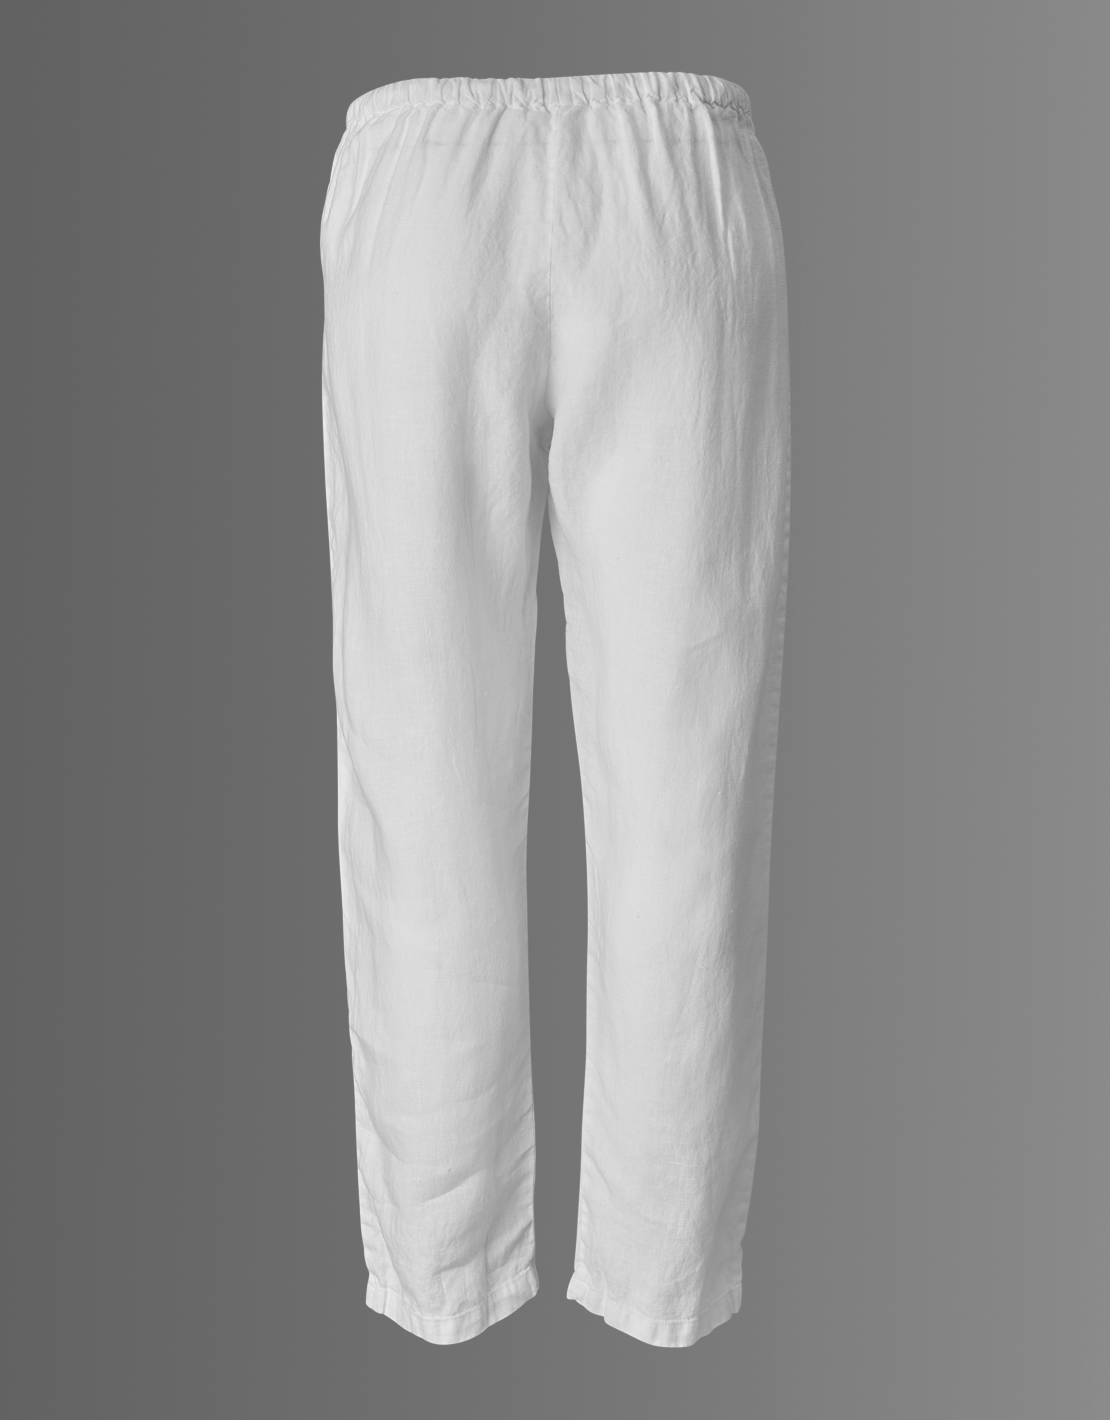 Linnebyxor white linen - Lin Living 1e5a6a3360b97